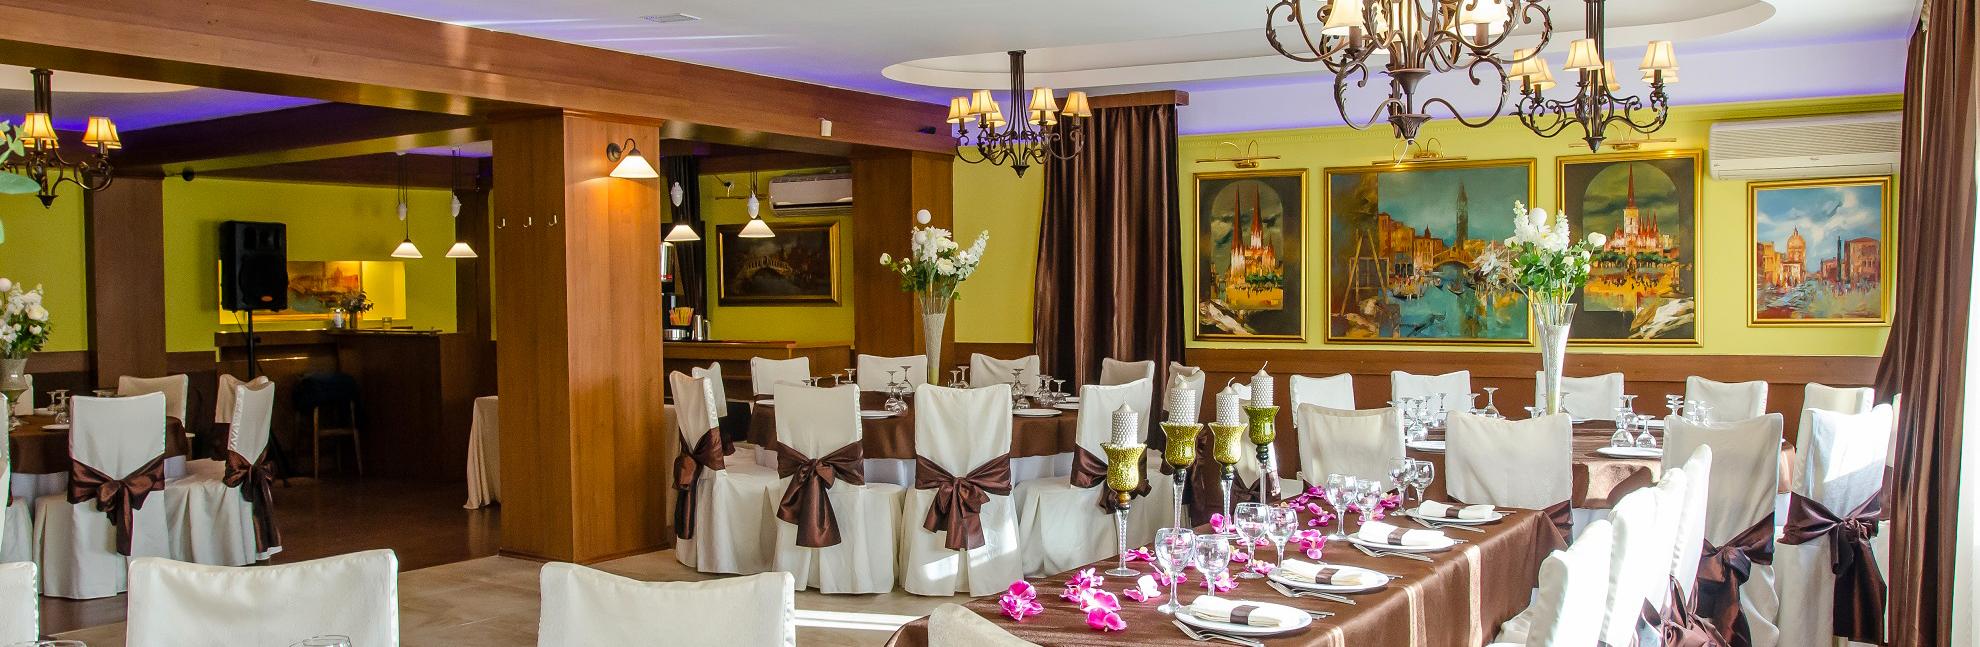 Salon Glasgow Imperia Oferte Nunti Restaurant Nunta Bucuresti